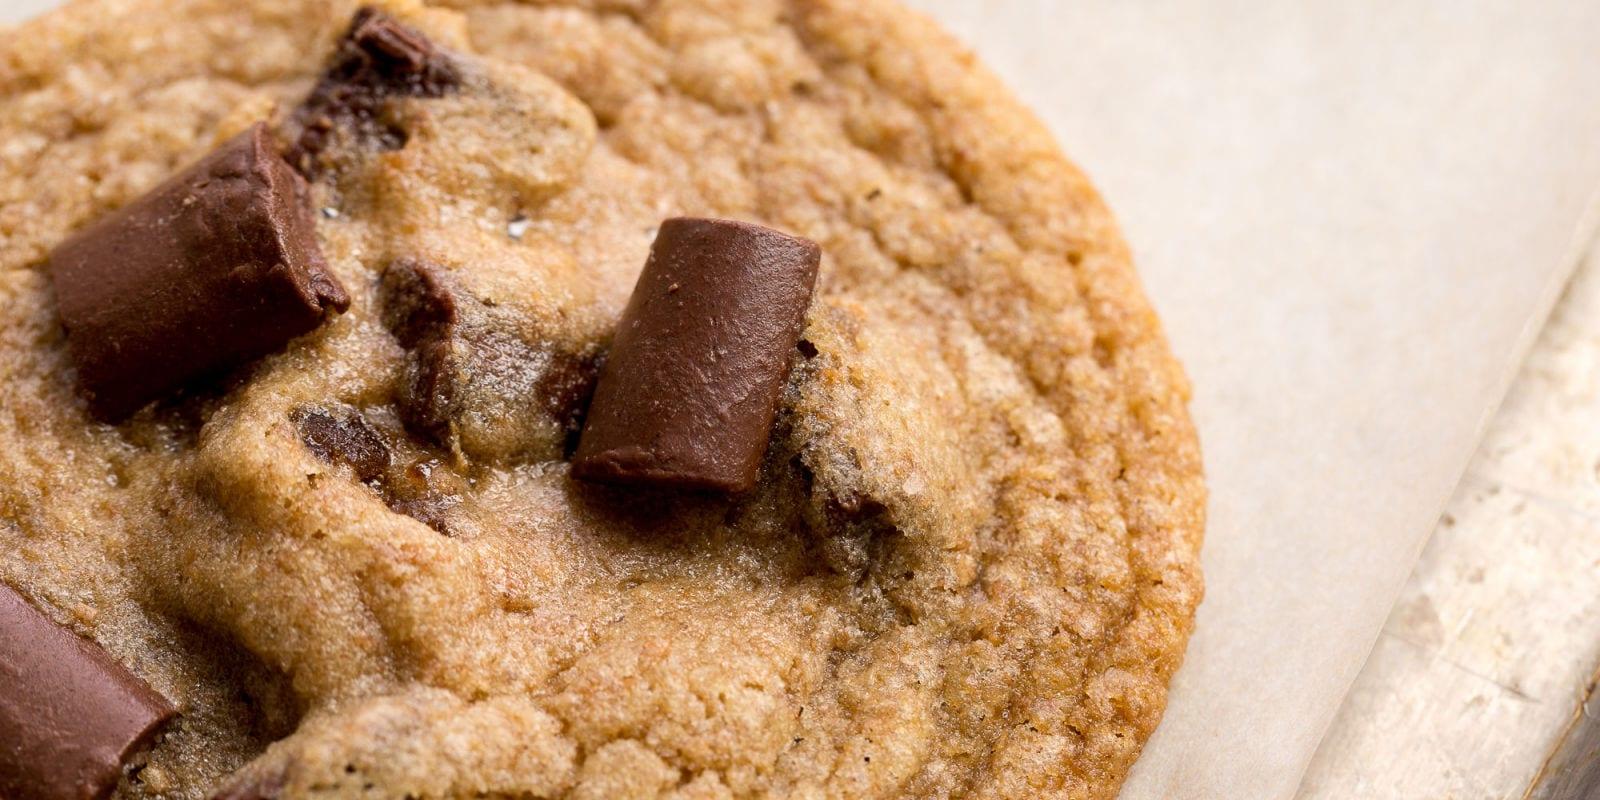 Homemade Chocolate Chip Cookies Calories